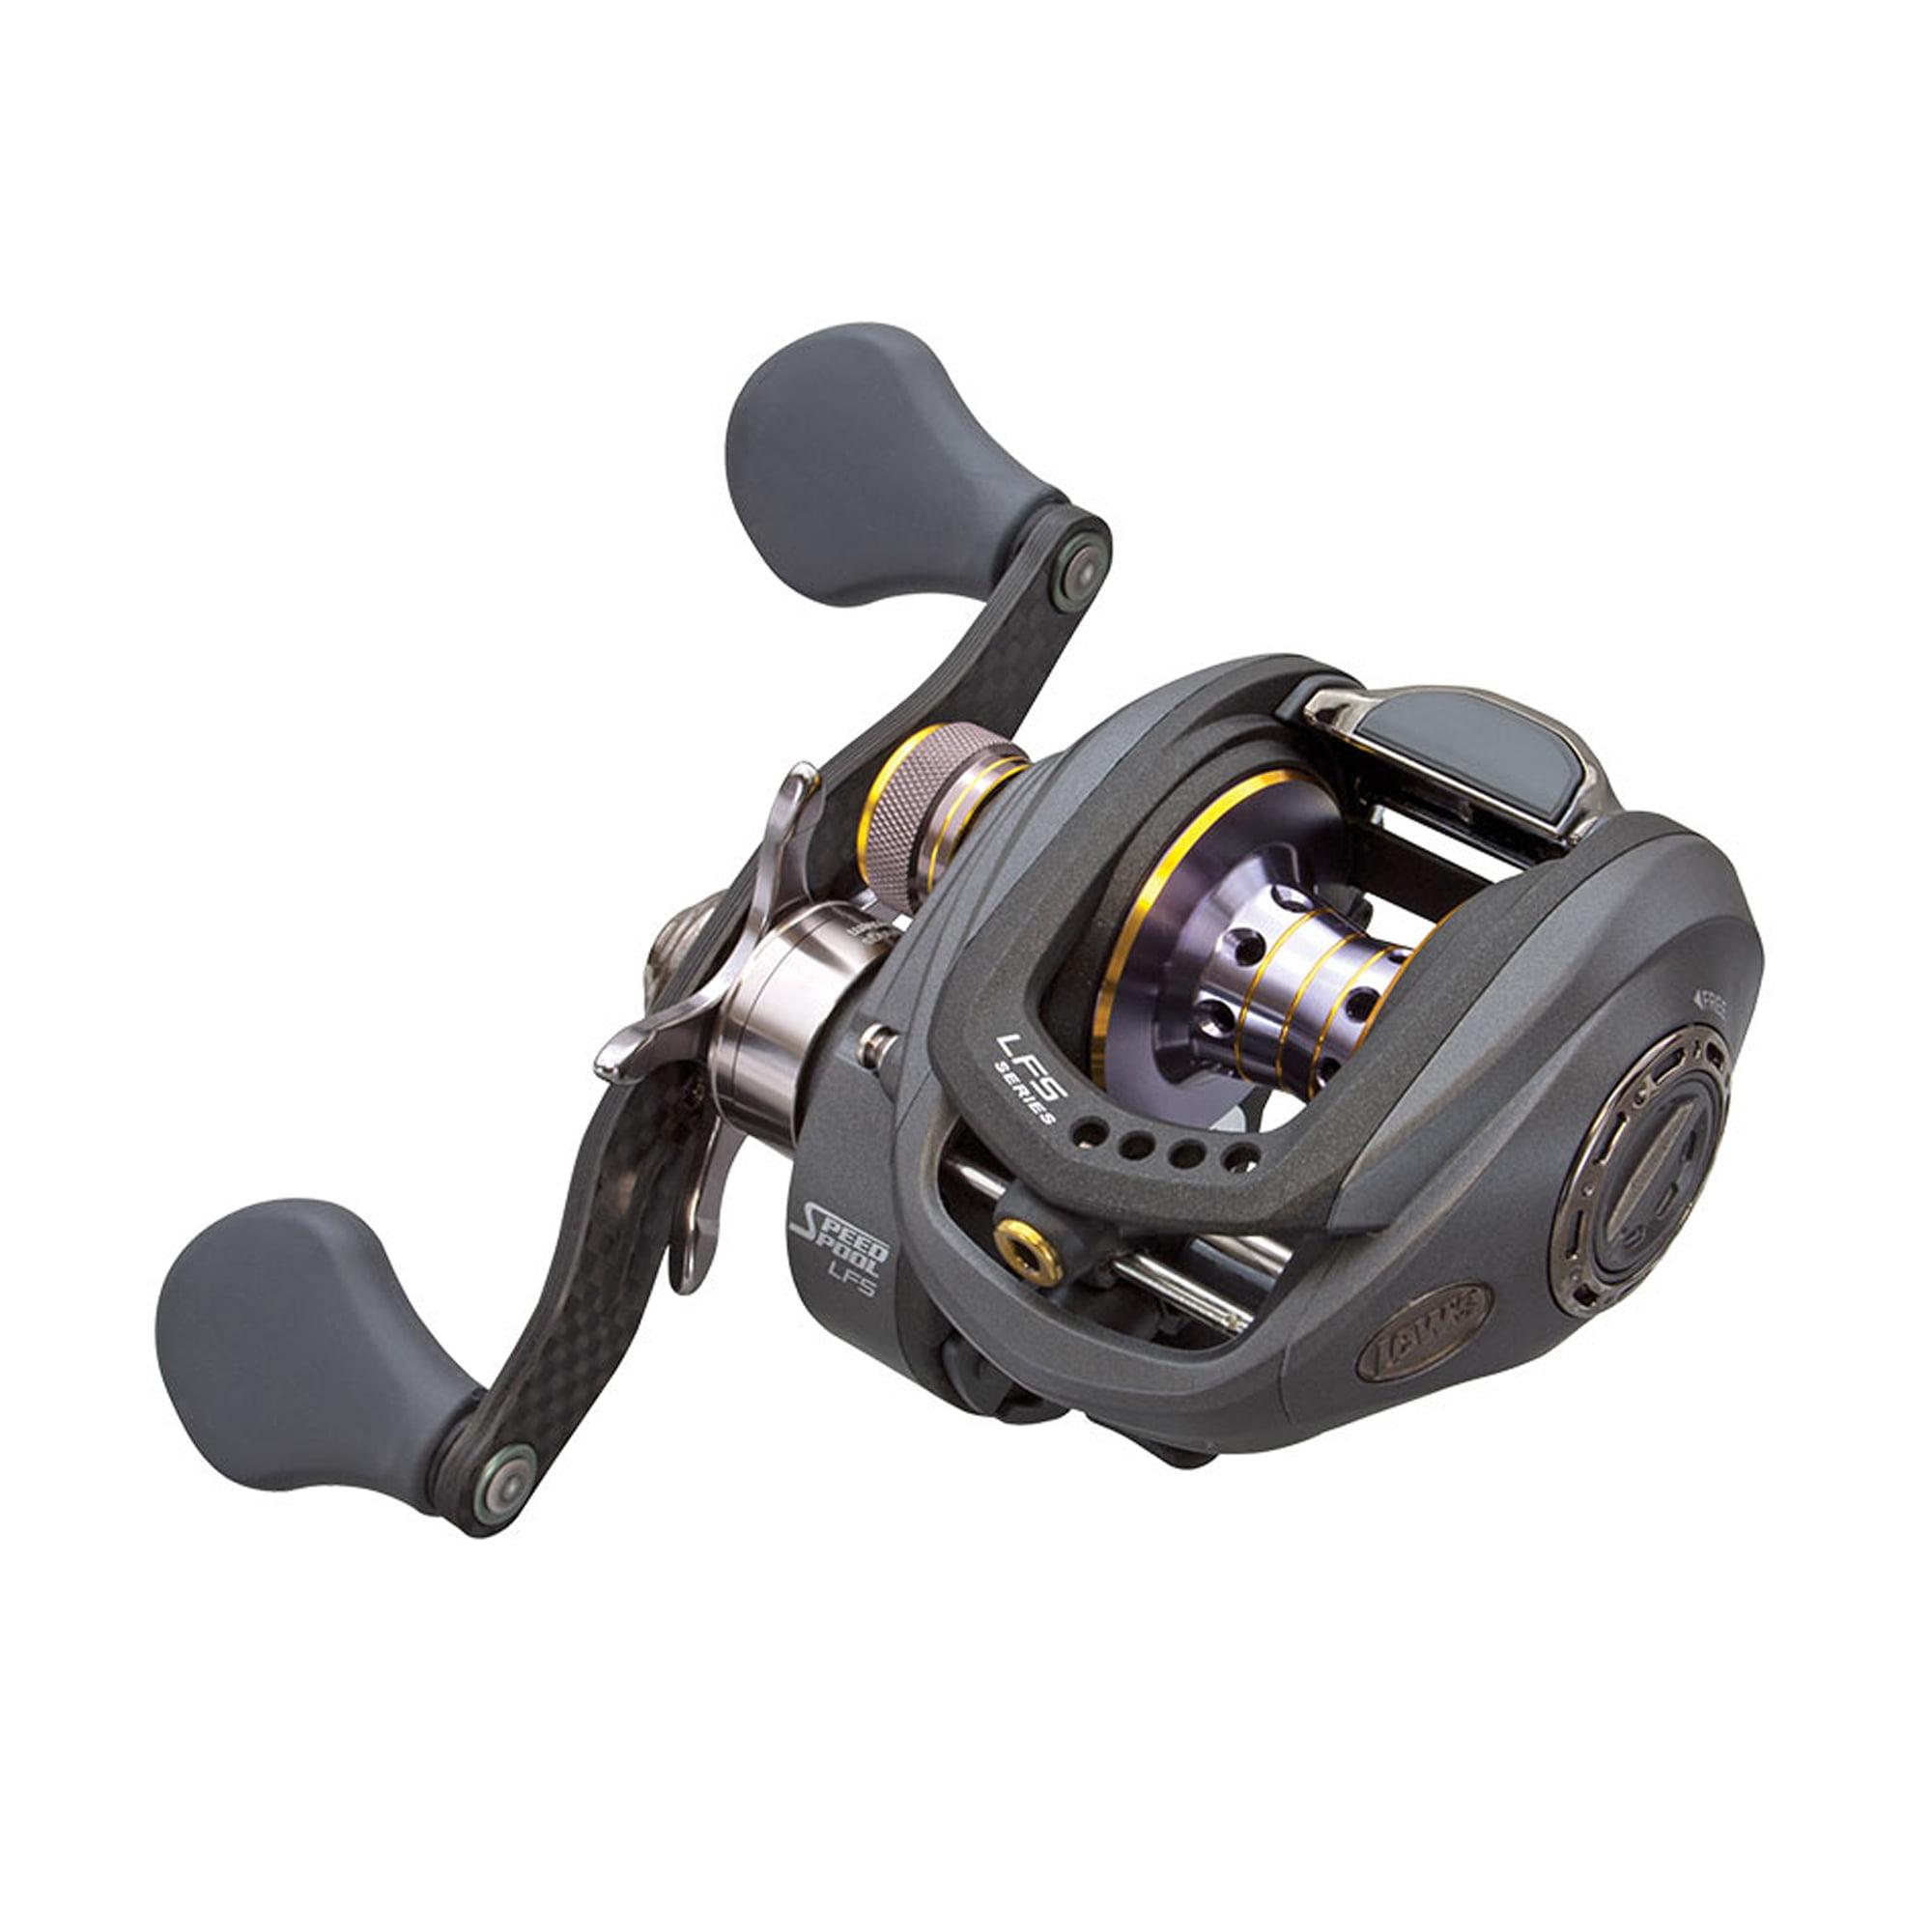 "Lews Fishing Tournament Pro G Speed Spool Reel 28"" IPT, 6.8:1 Gear Ratio, 10+1 Bearings, Left Hand by Lews Fishing"